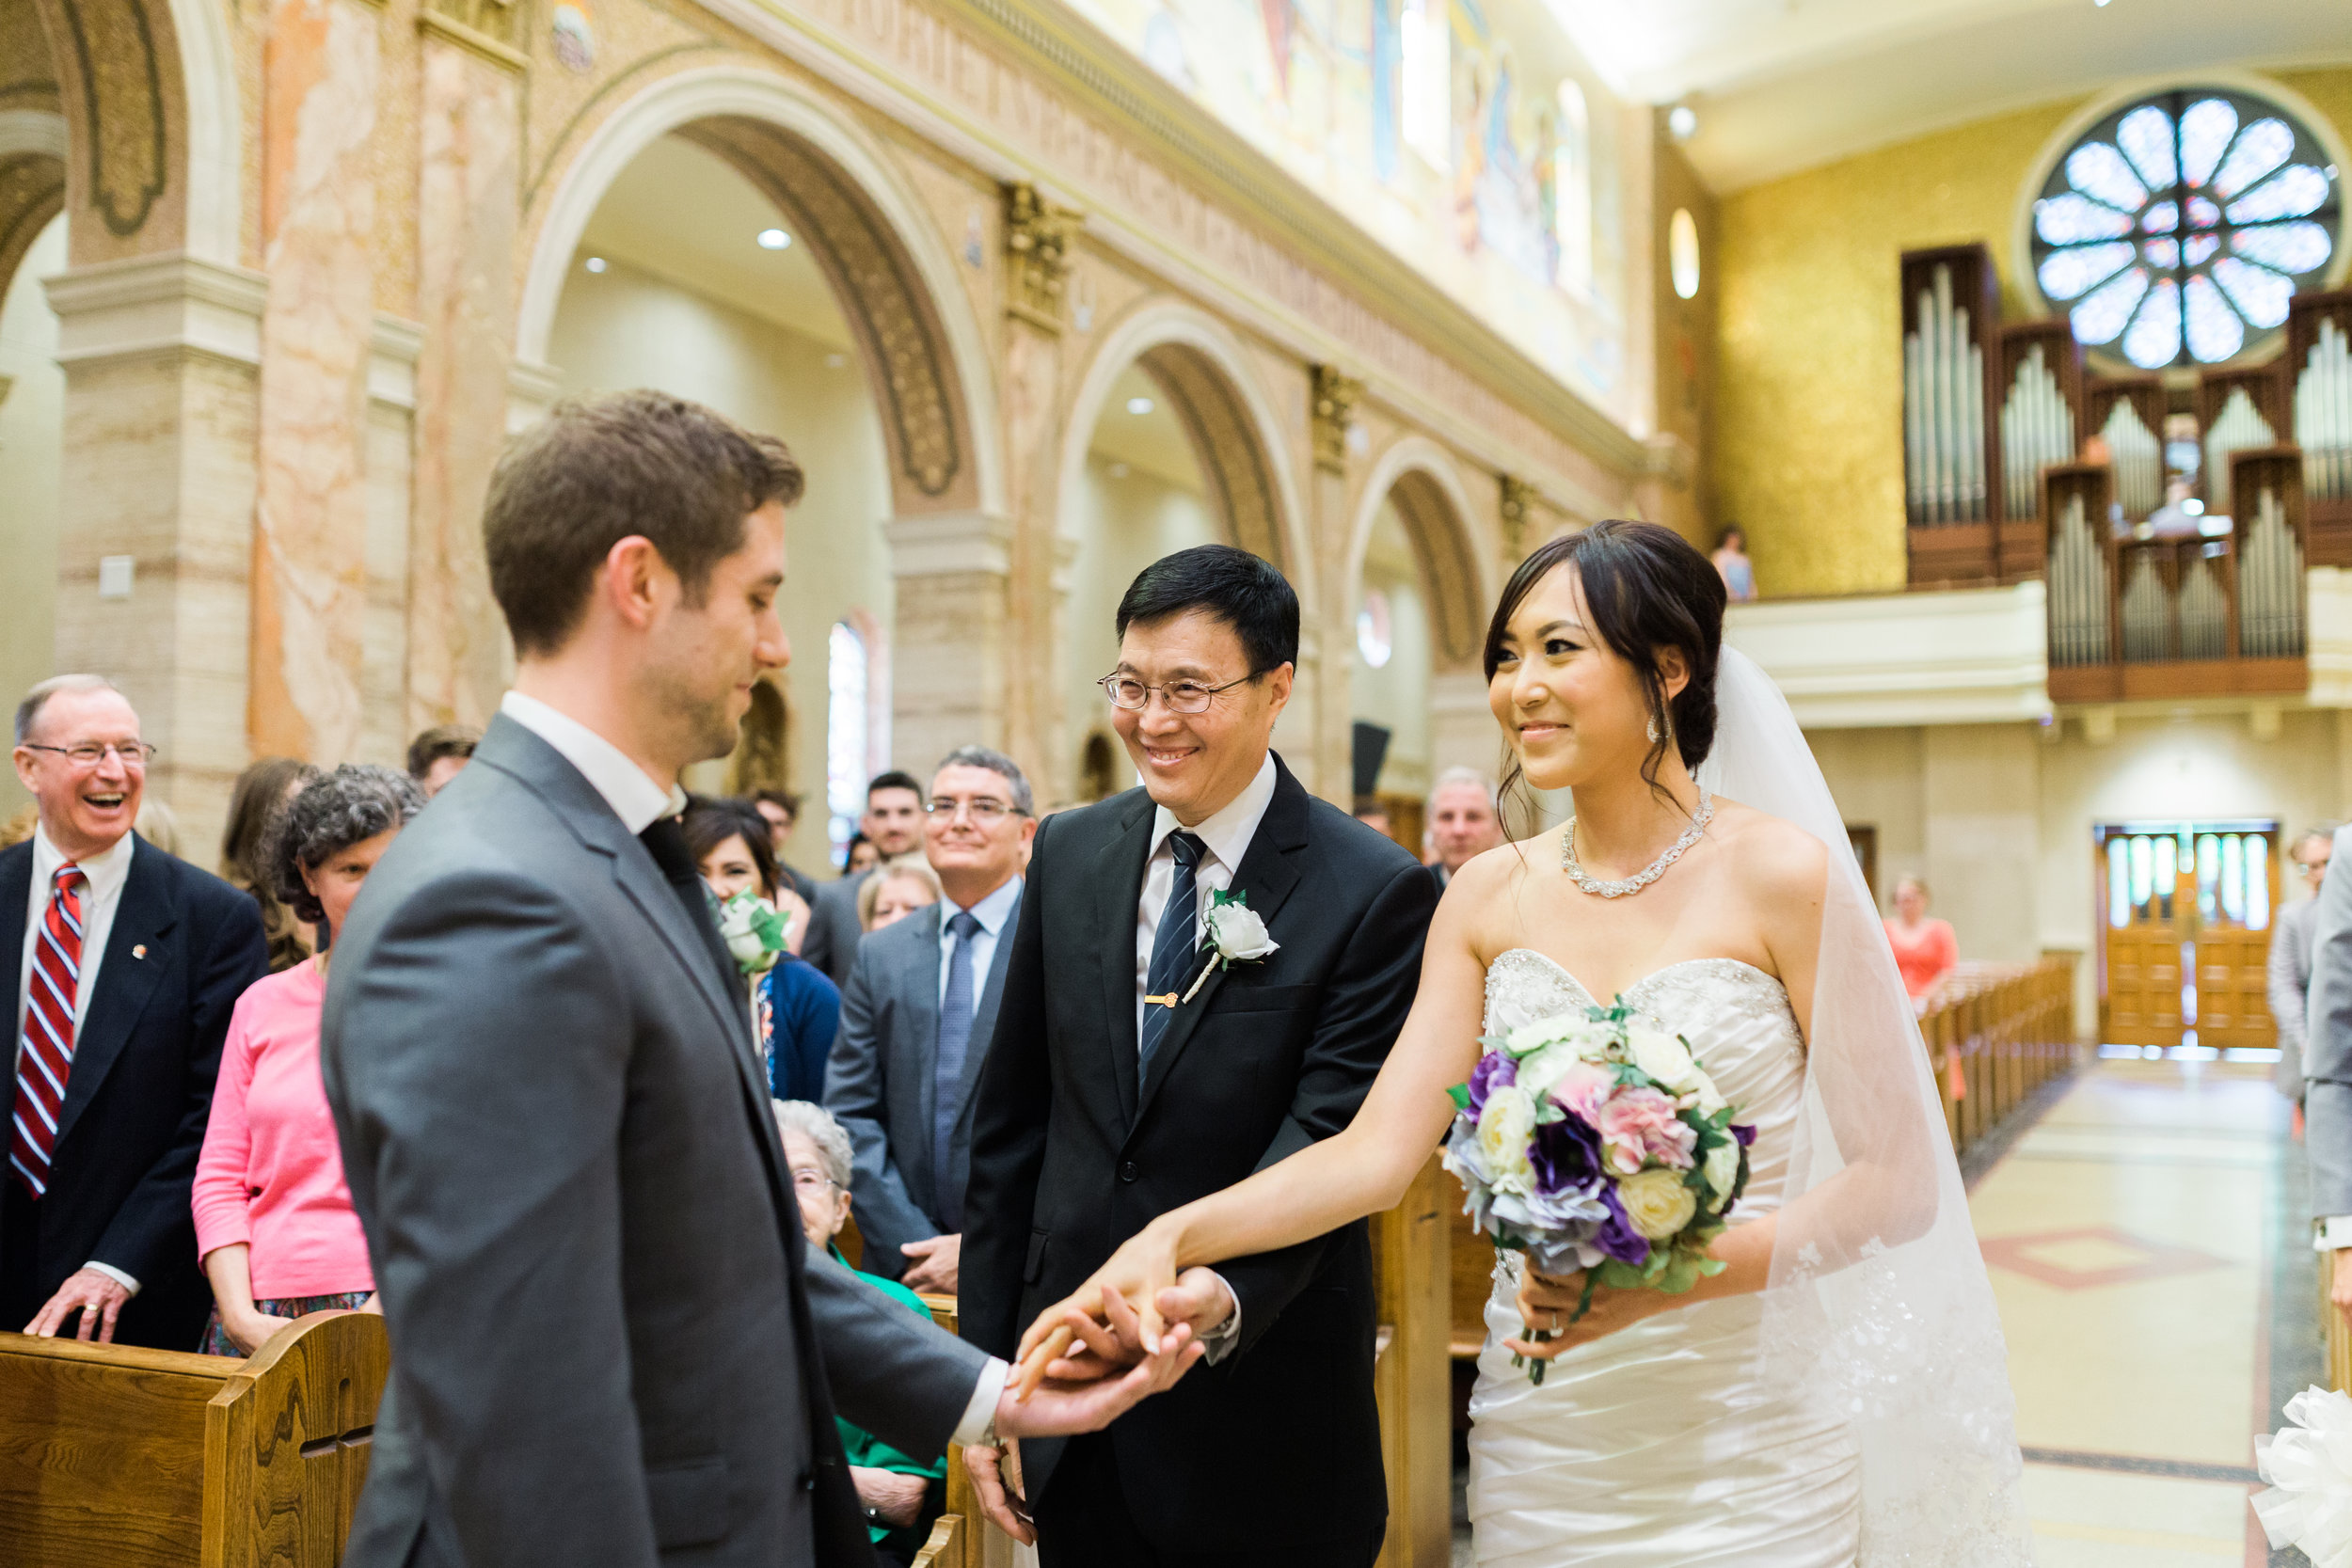 Toronto Fine Art Photographer - Lady of Sorrows Catholic Church Wedding - Ceremony-49.jpg